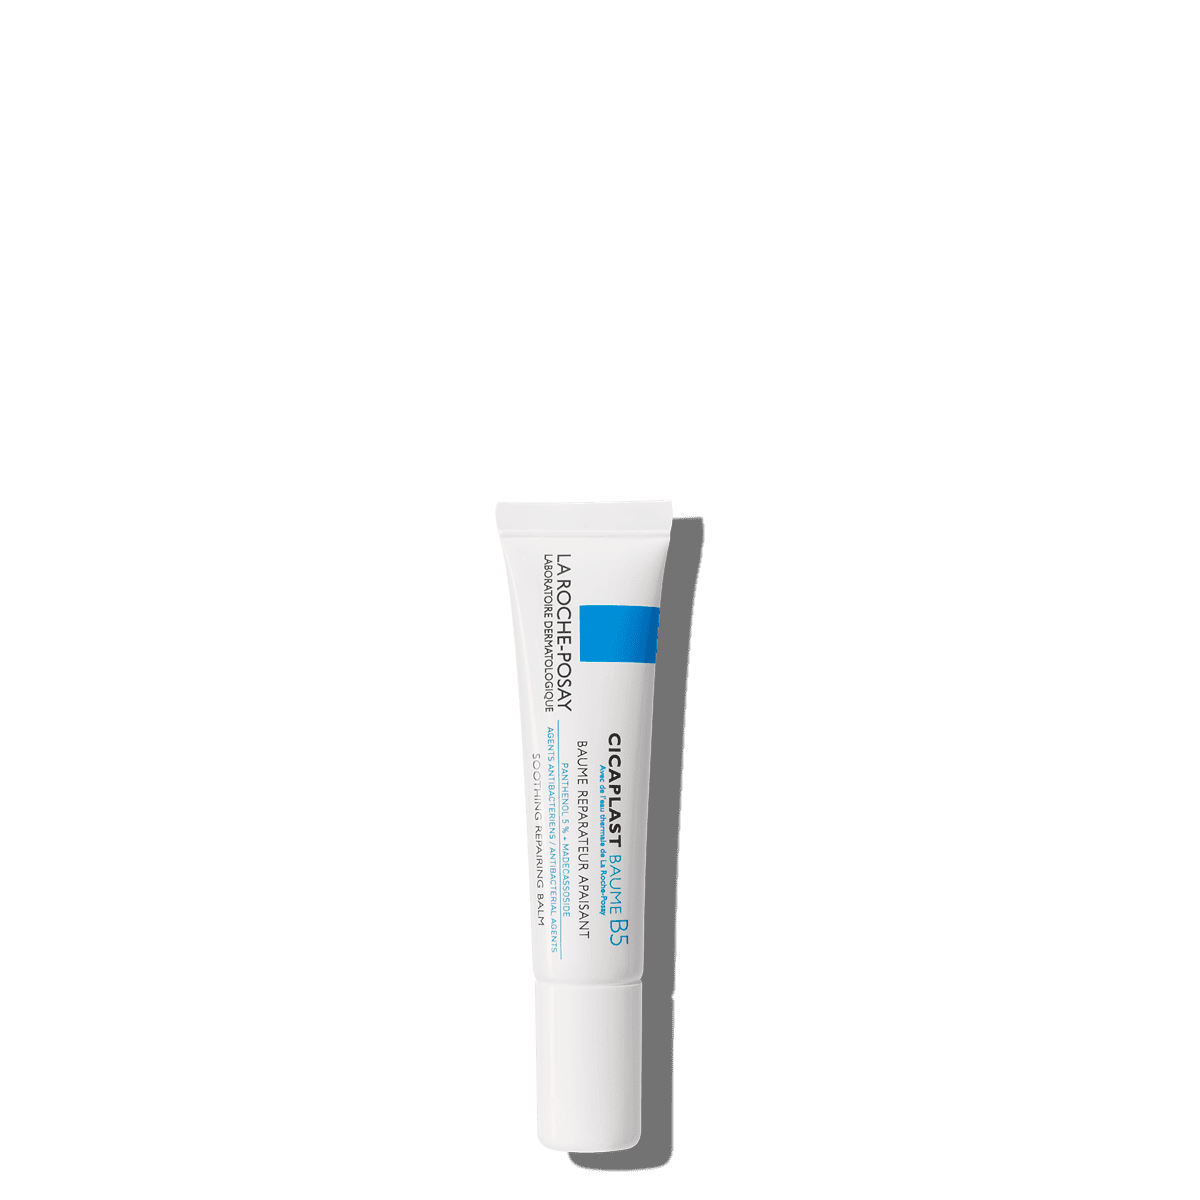 La Roche Posay ProduktSide Skadet Cicaplast Baume B5 15ml 33378724187